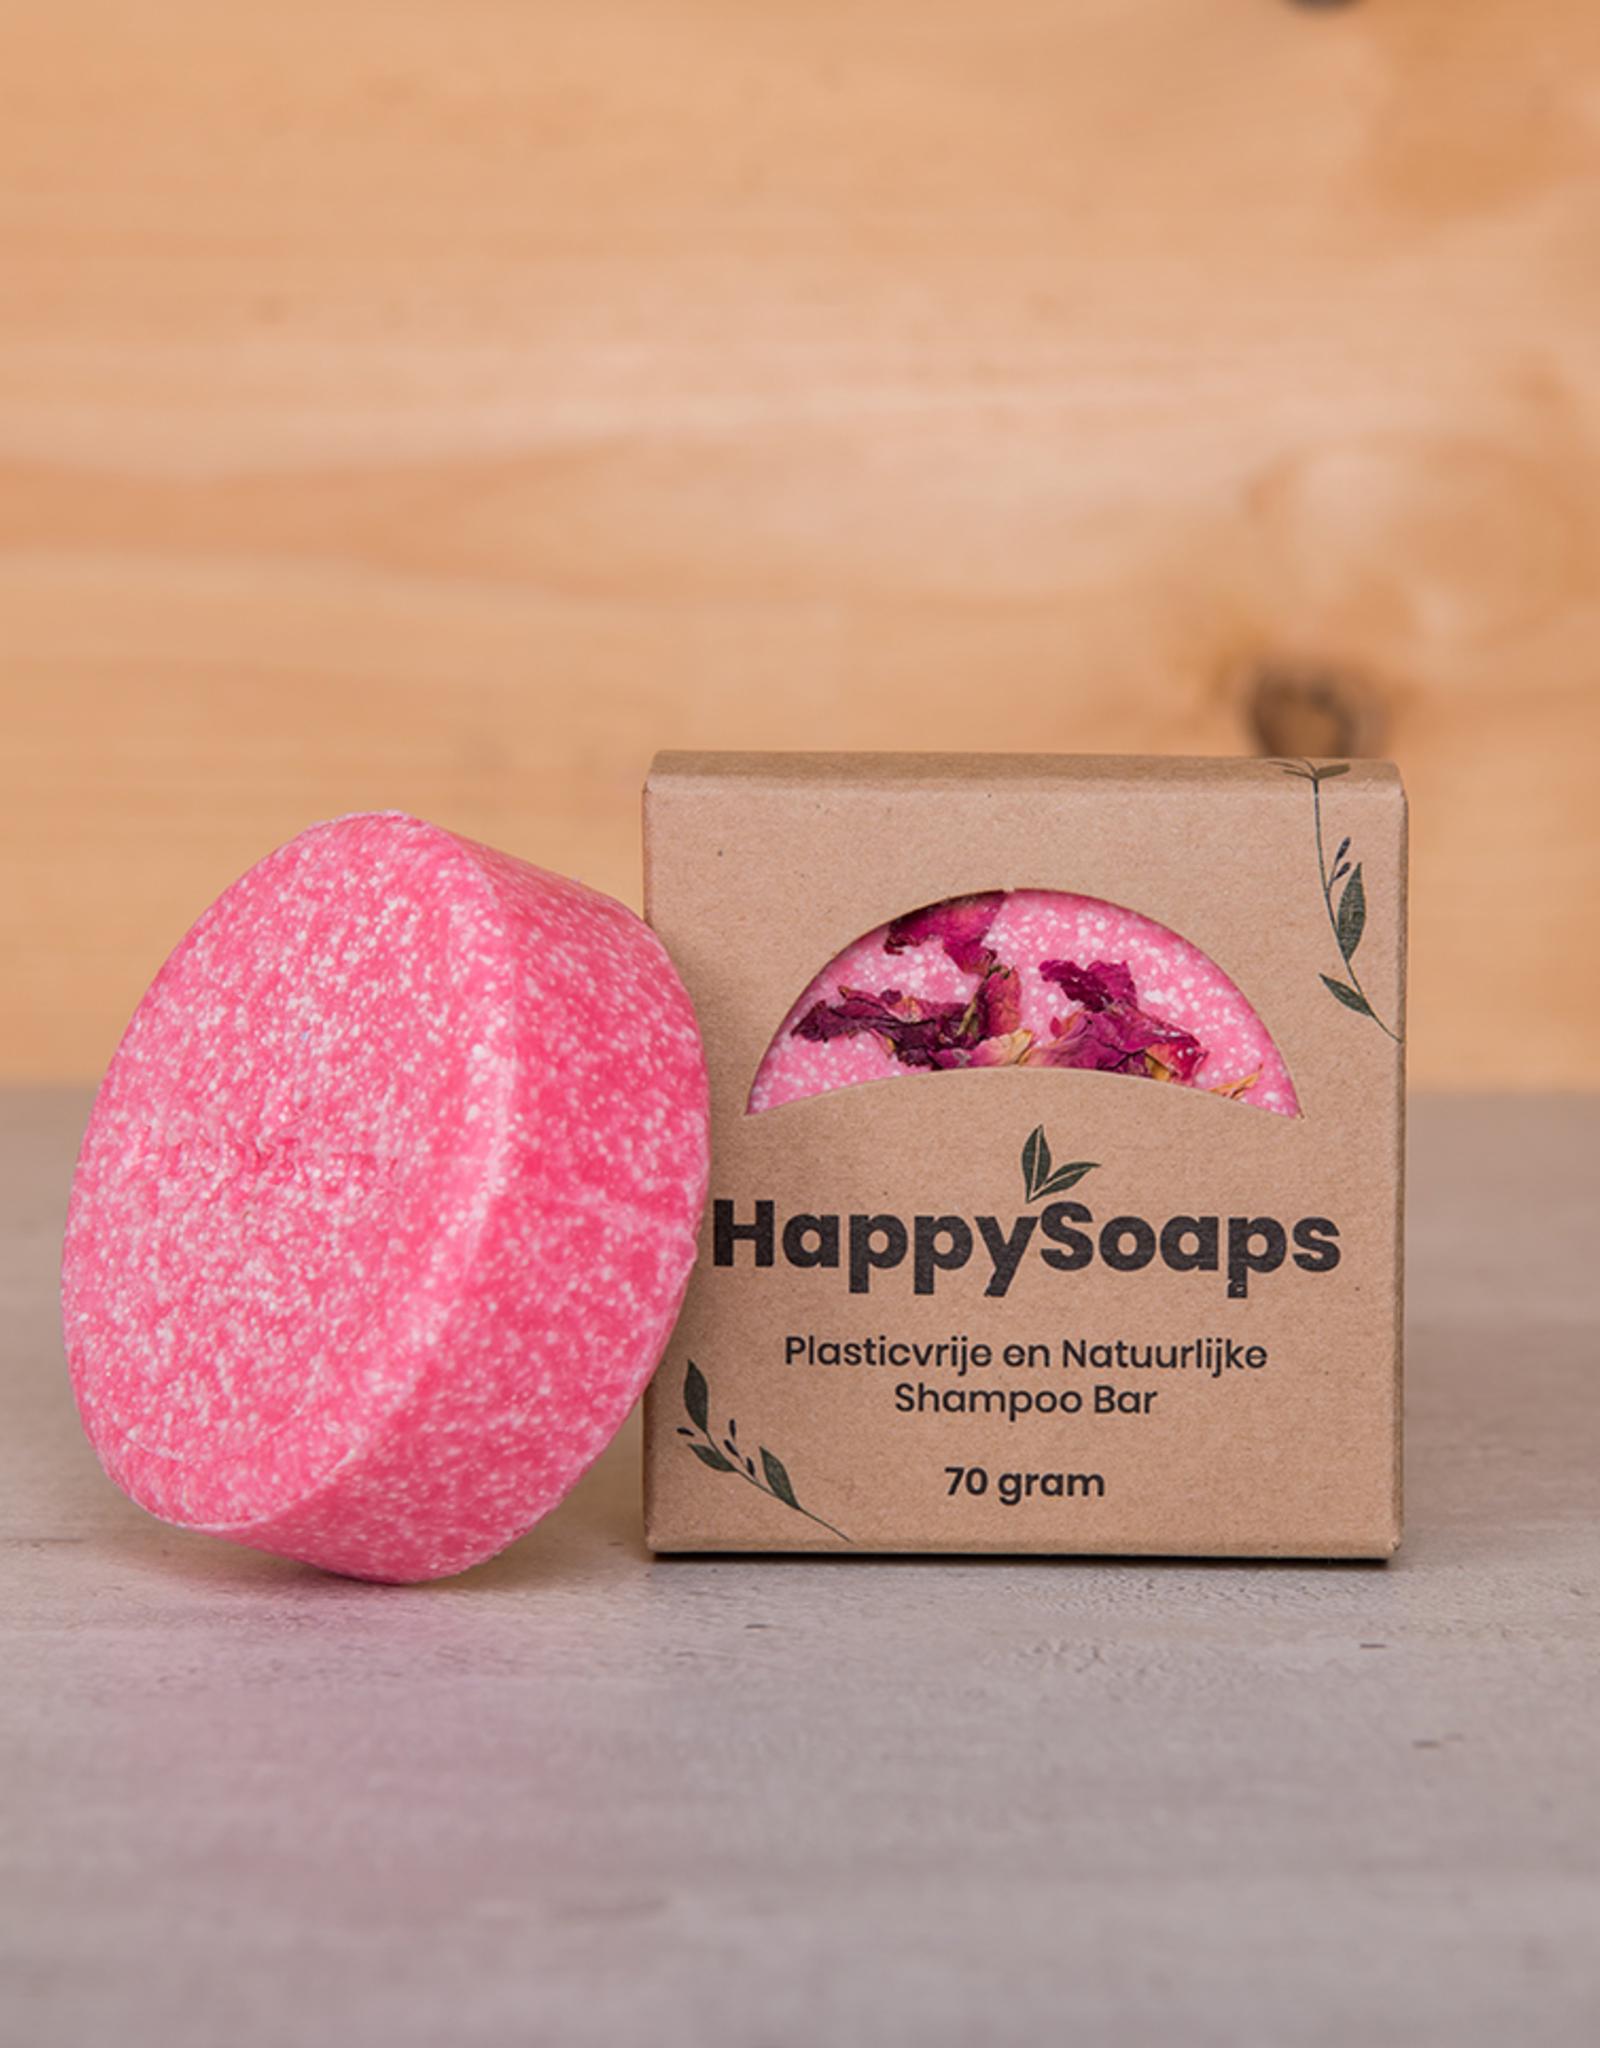 HappySoaps La Vie en Rose Shampoo Bar 70gram - HappySoaps